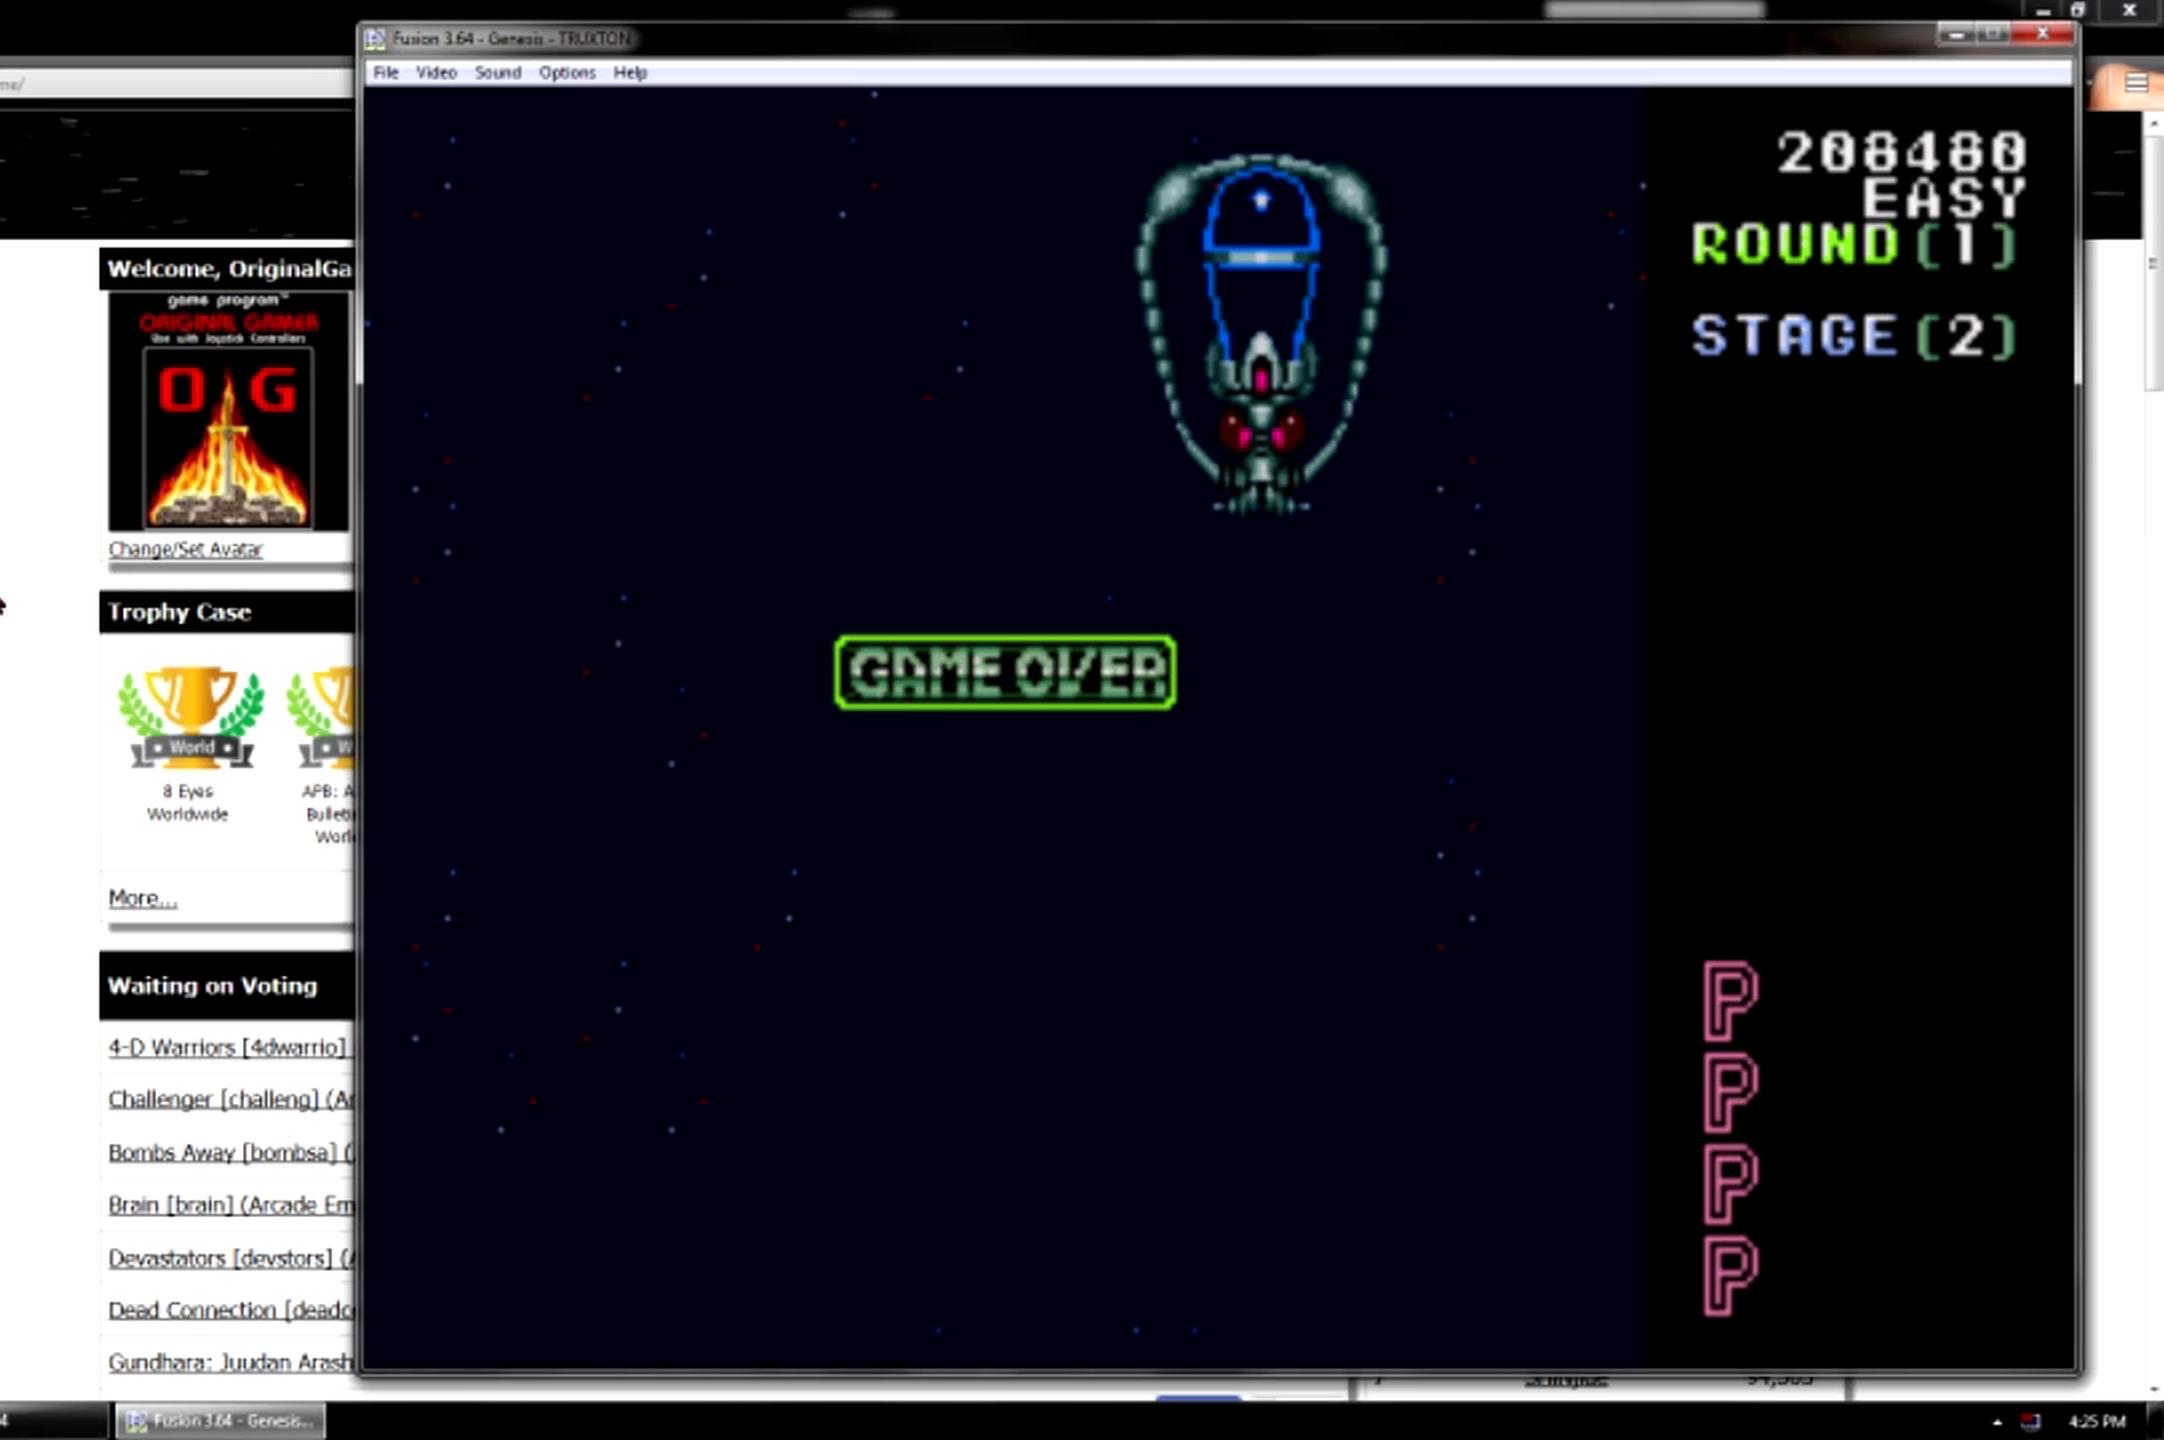 OriginalGamer: Truxton: Easy (Sega Genesis / MegaDrive Emulated) 208,480 points on 2015-06-25 05:04:42